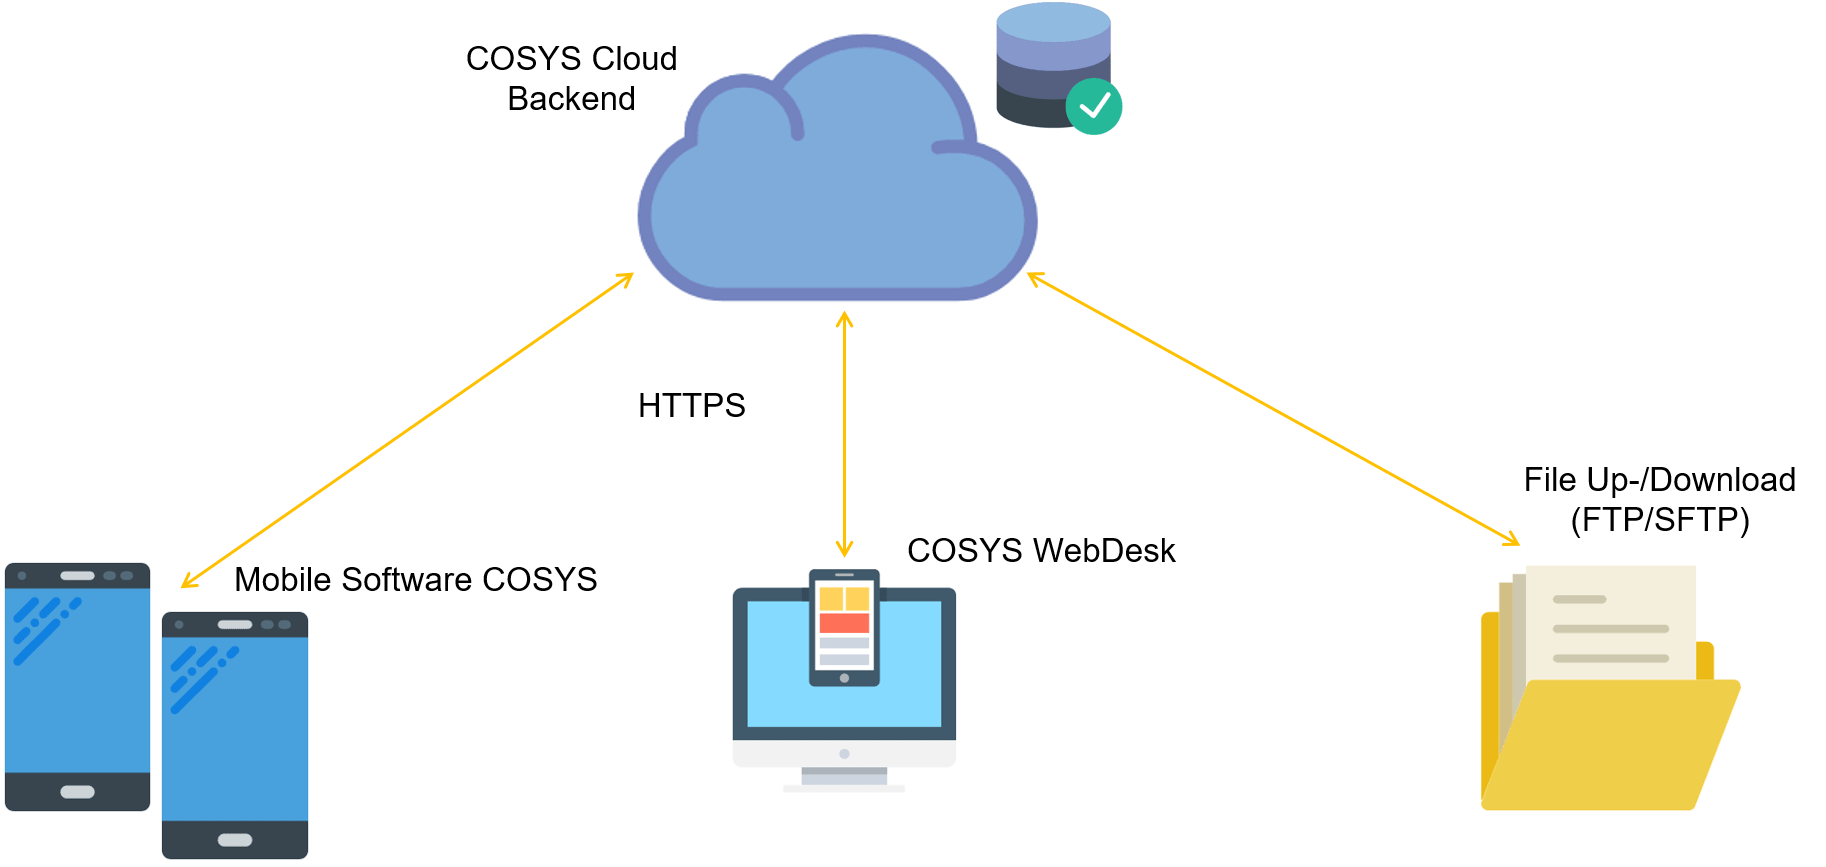 Datenübertragung COSYS Cloud Big Data Analytics